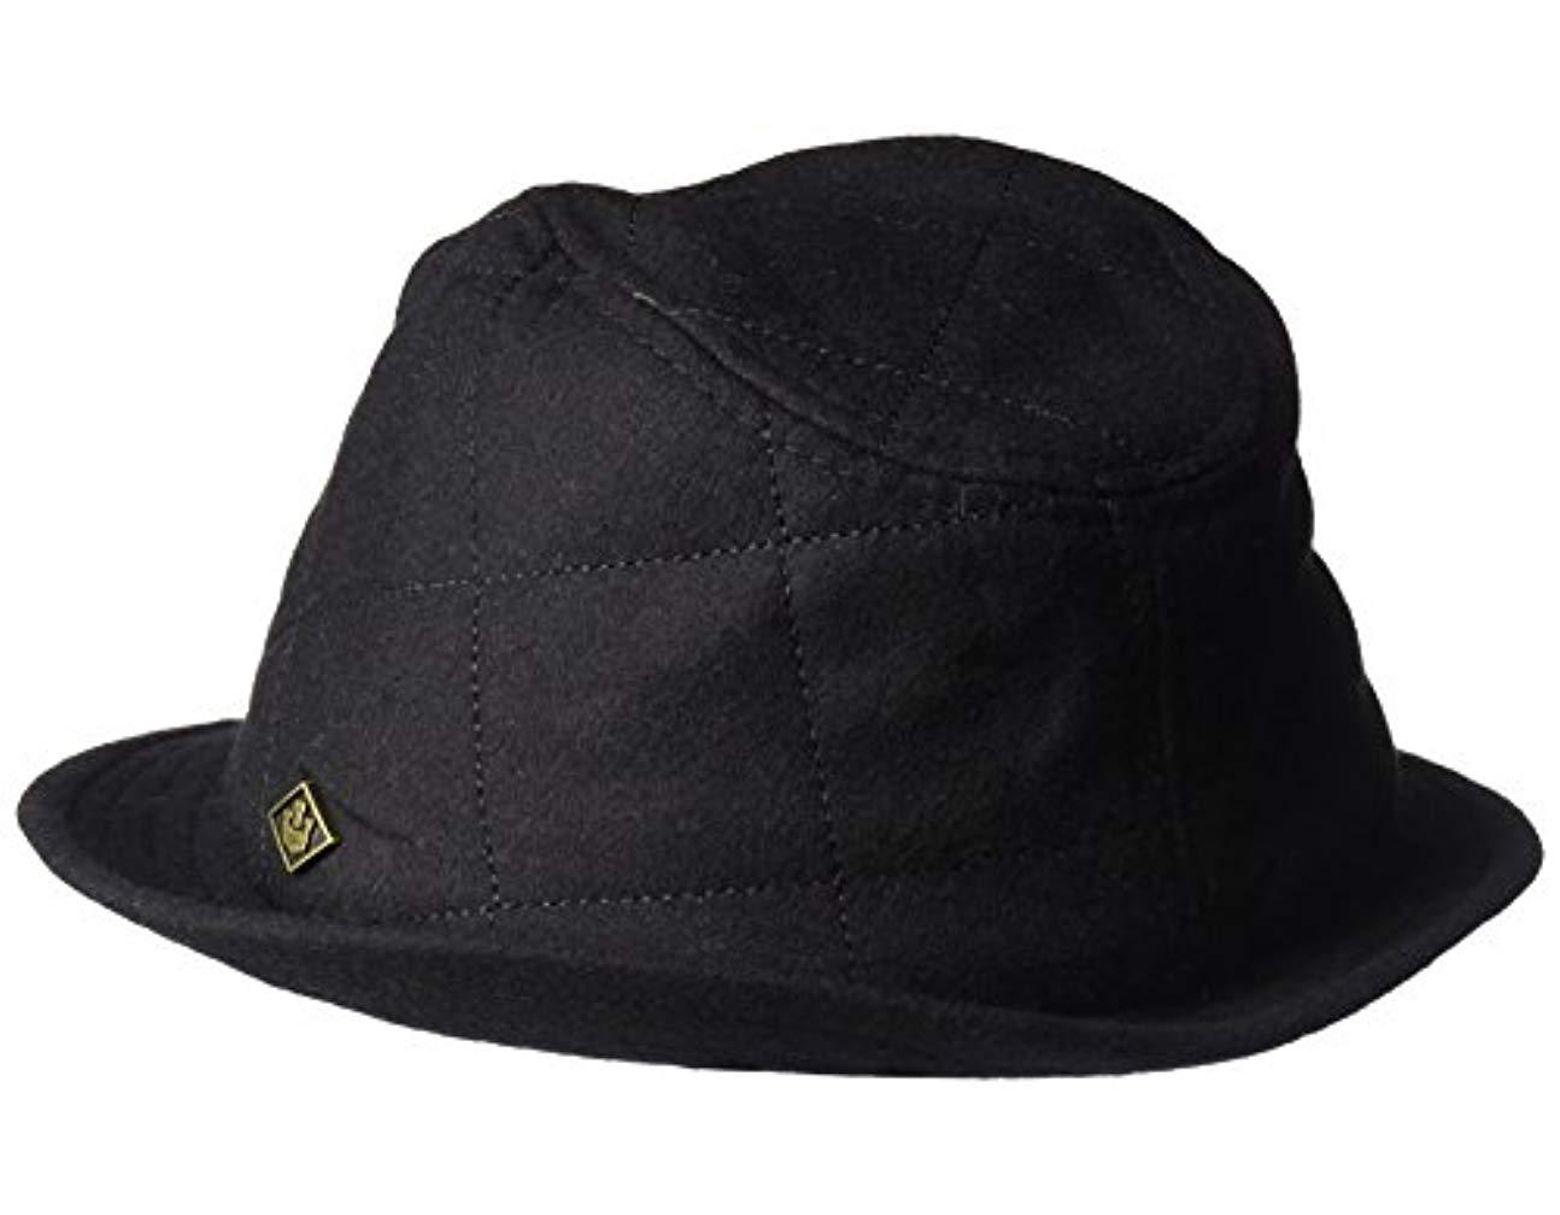 0696f042ad0aa5 Goorin Bros Huck Knit Fedora Hat in Black for Men - Lyst